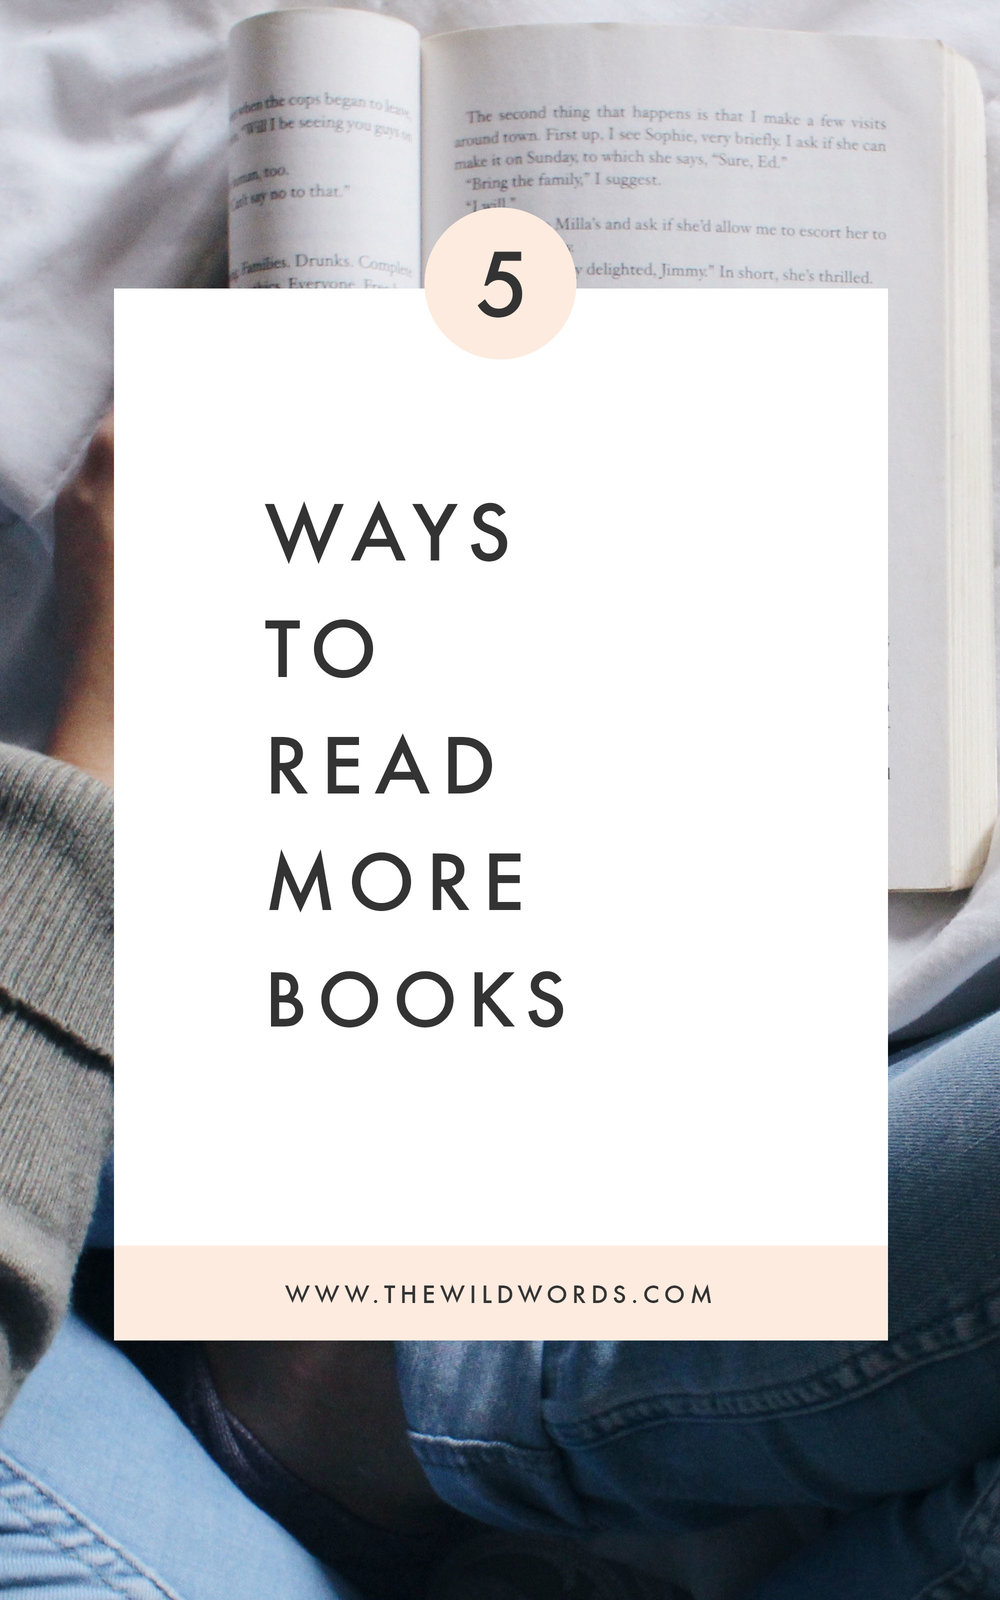 5 Ways to Read More Books (via Wild Words) #reading #creativity #writinglife